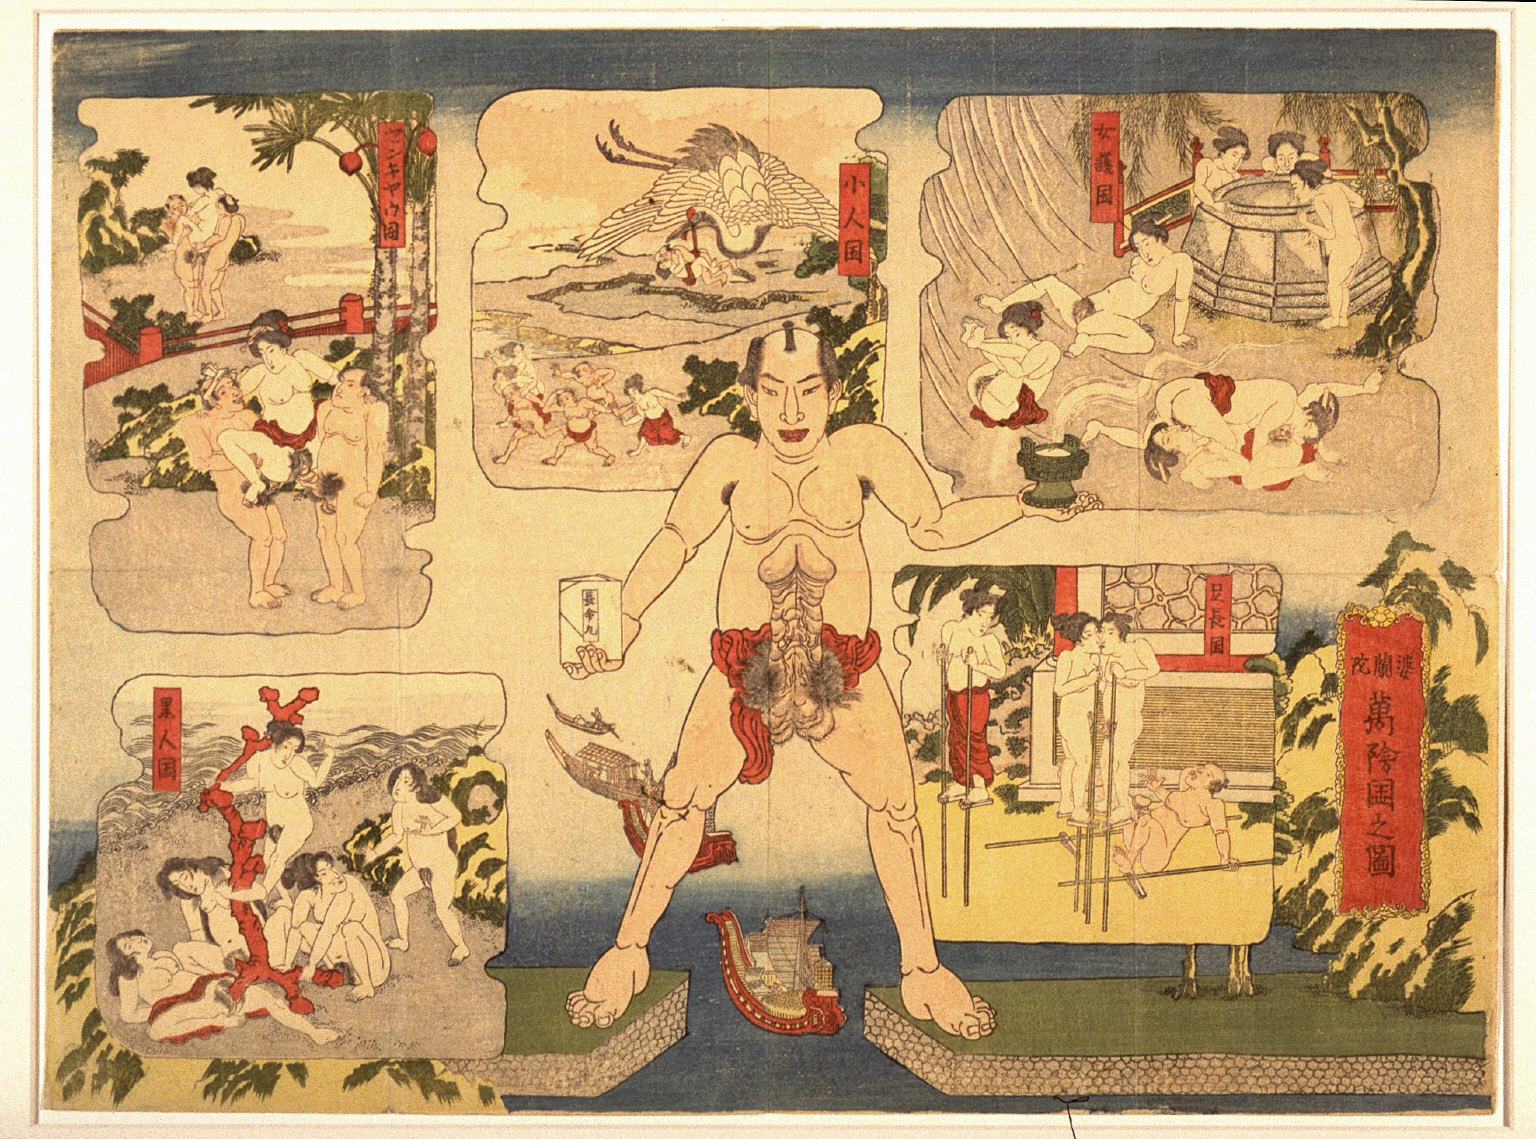 Illustrations of All Secret Countries (Ban inkoku no zu)